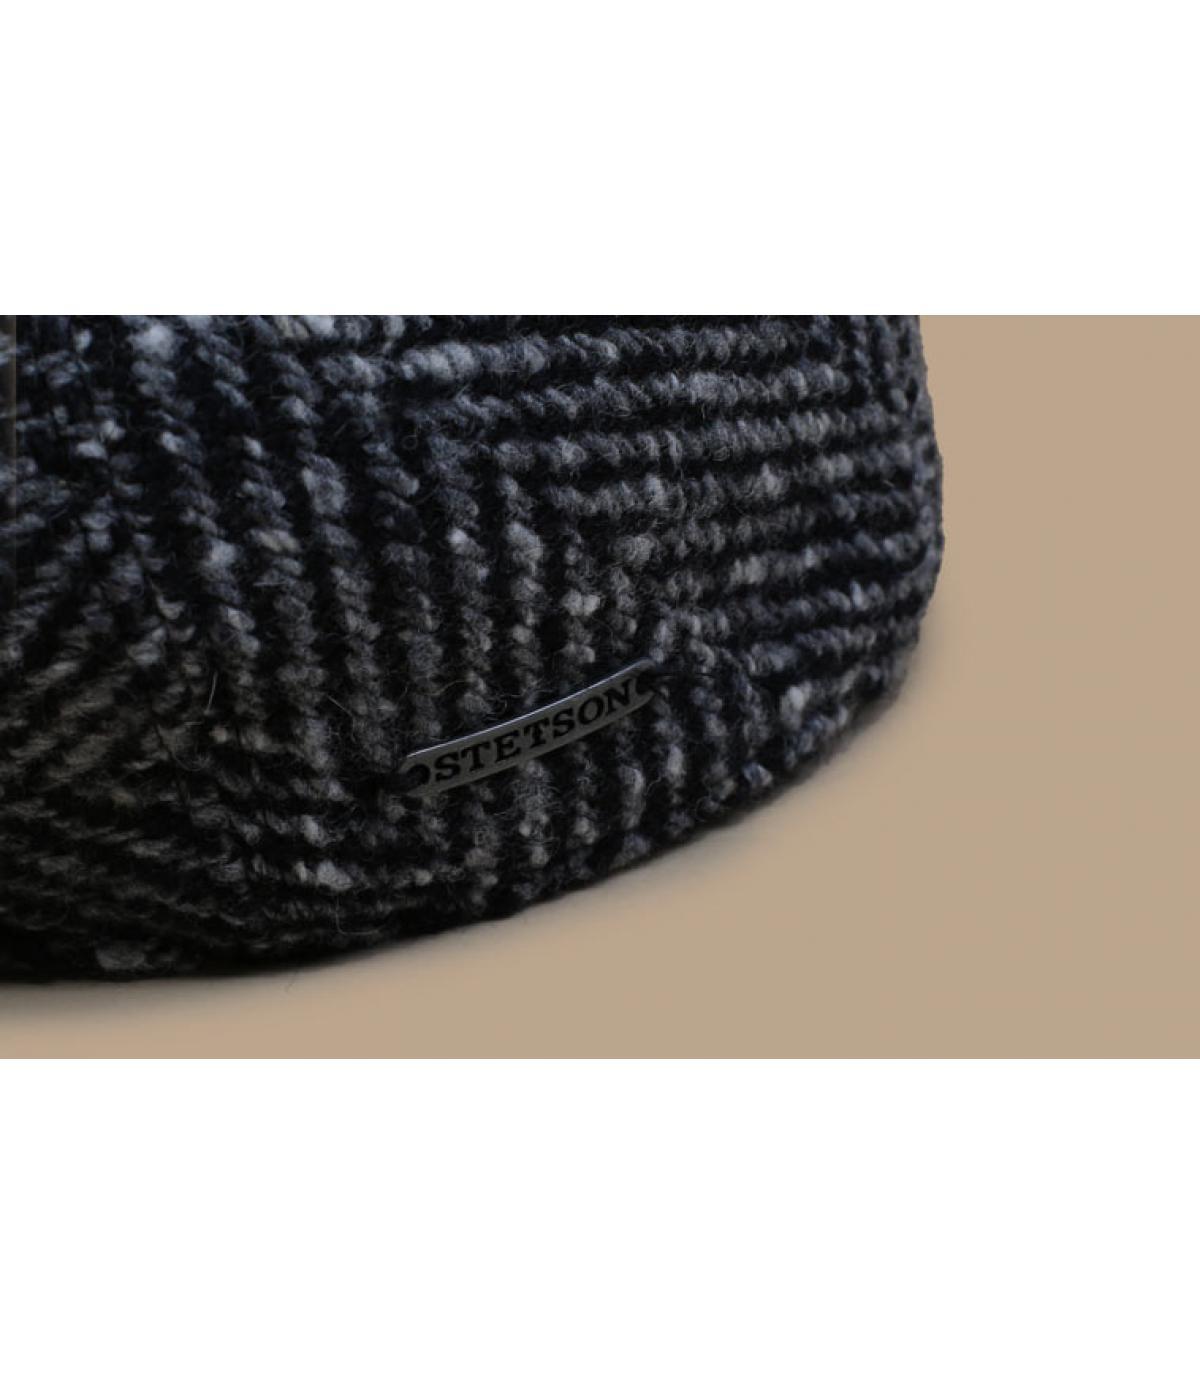 Dettagli Ivy Cap Herringbone black white - image 3